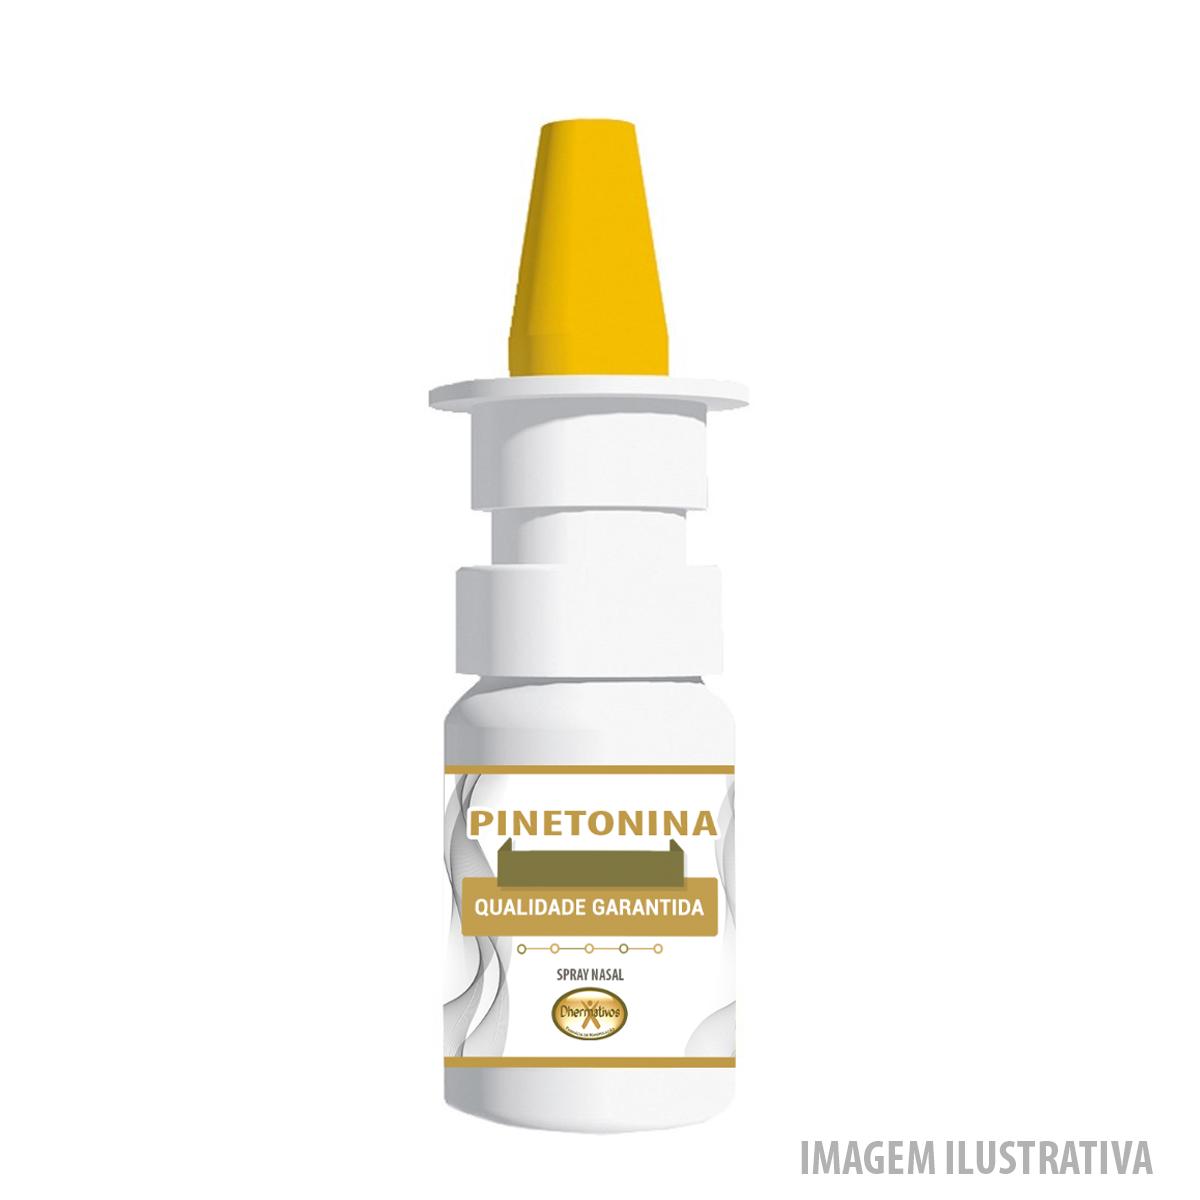 Pinetonina 30% Spray Nasal 30ml